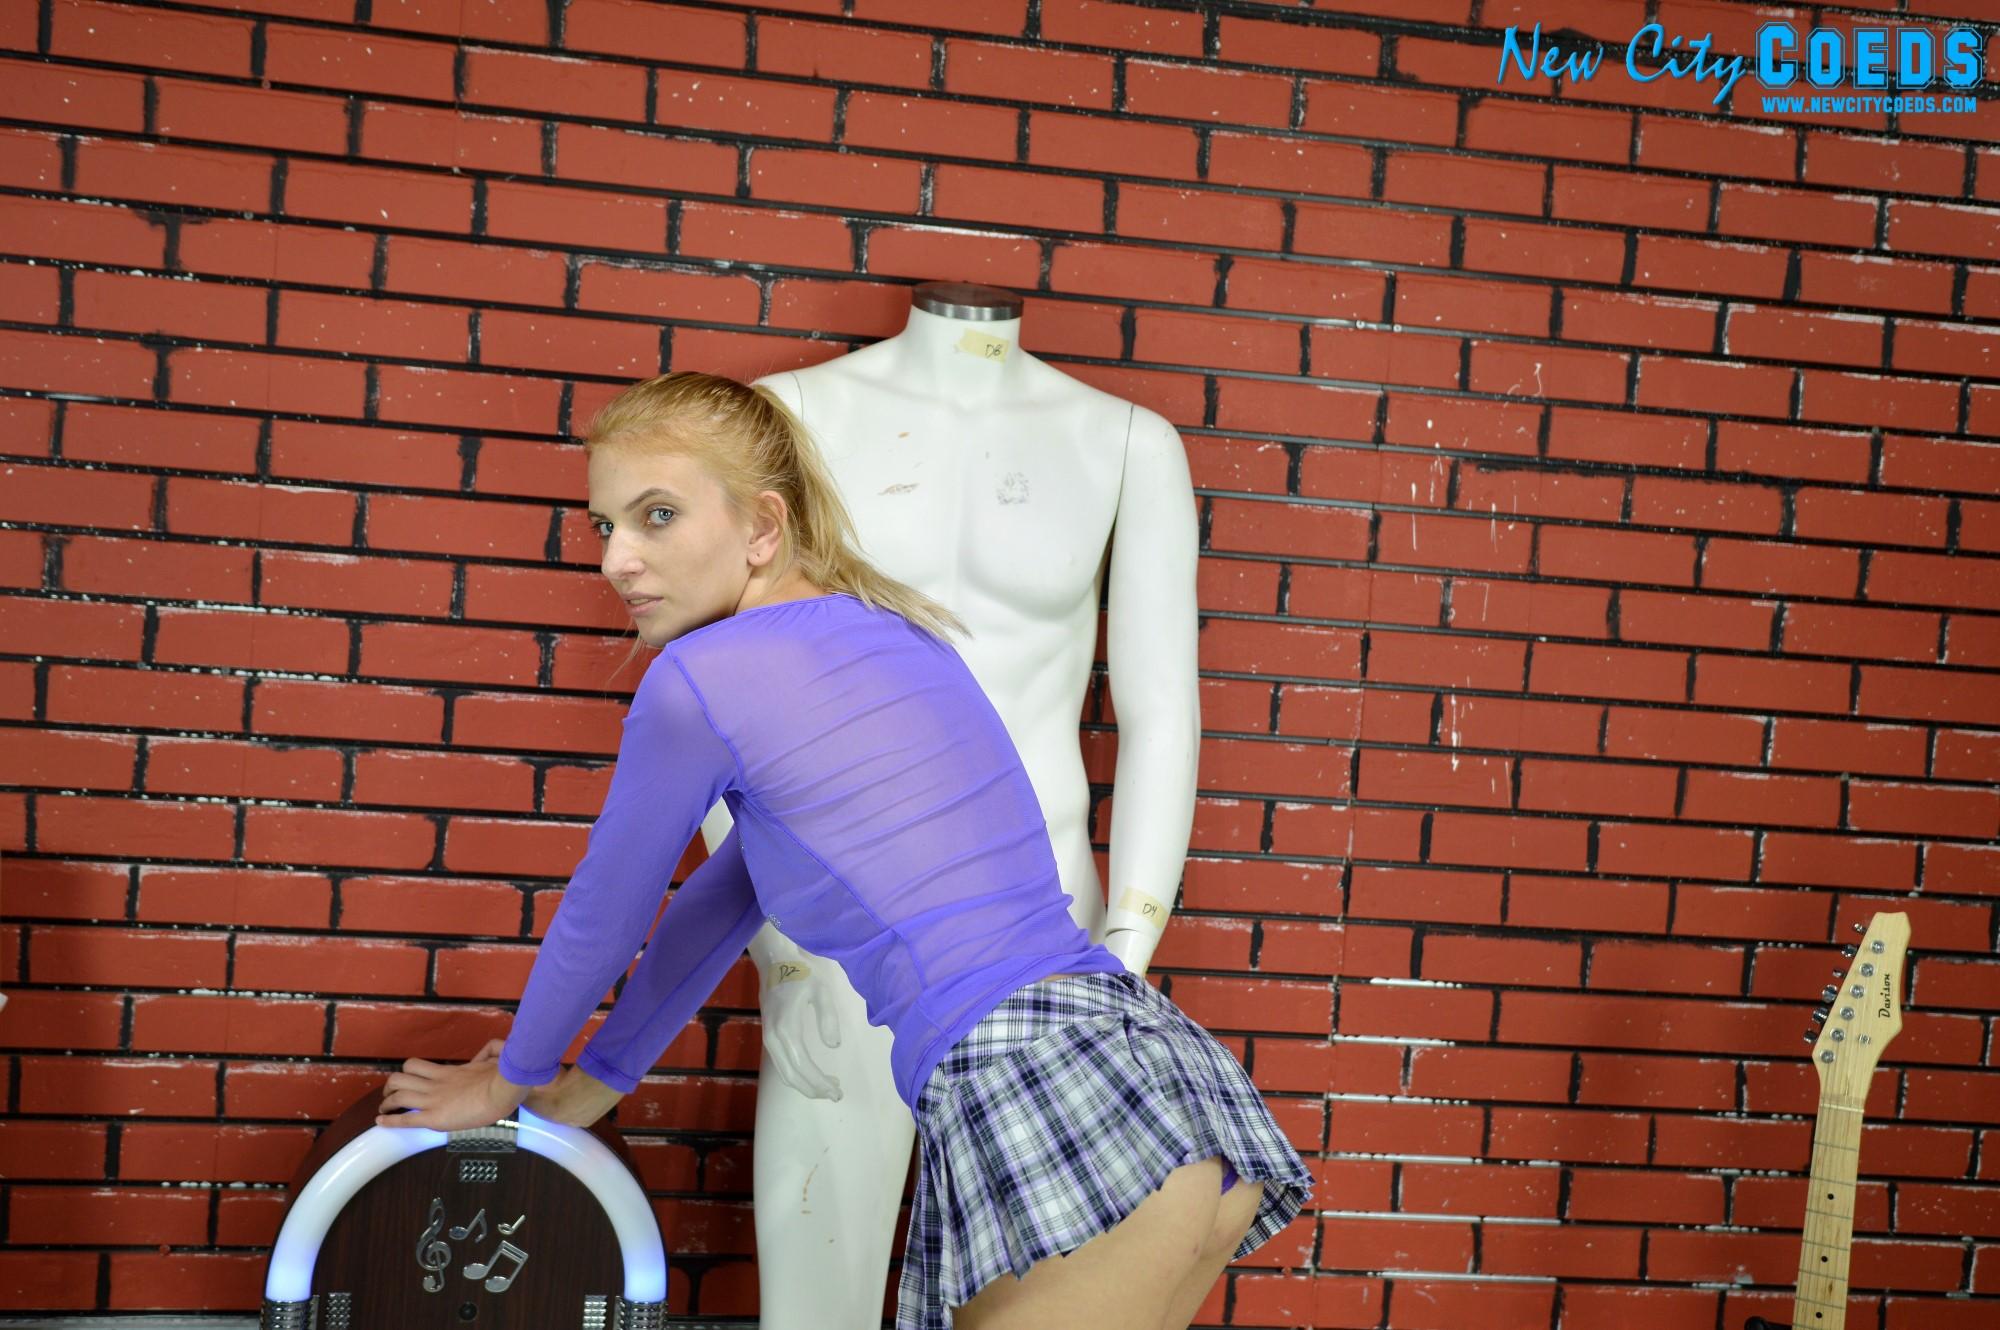 Mandy Coed Model - Bad School Girl - New City Coeds